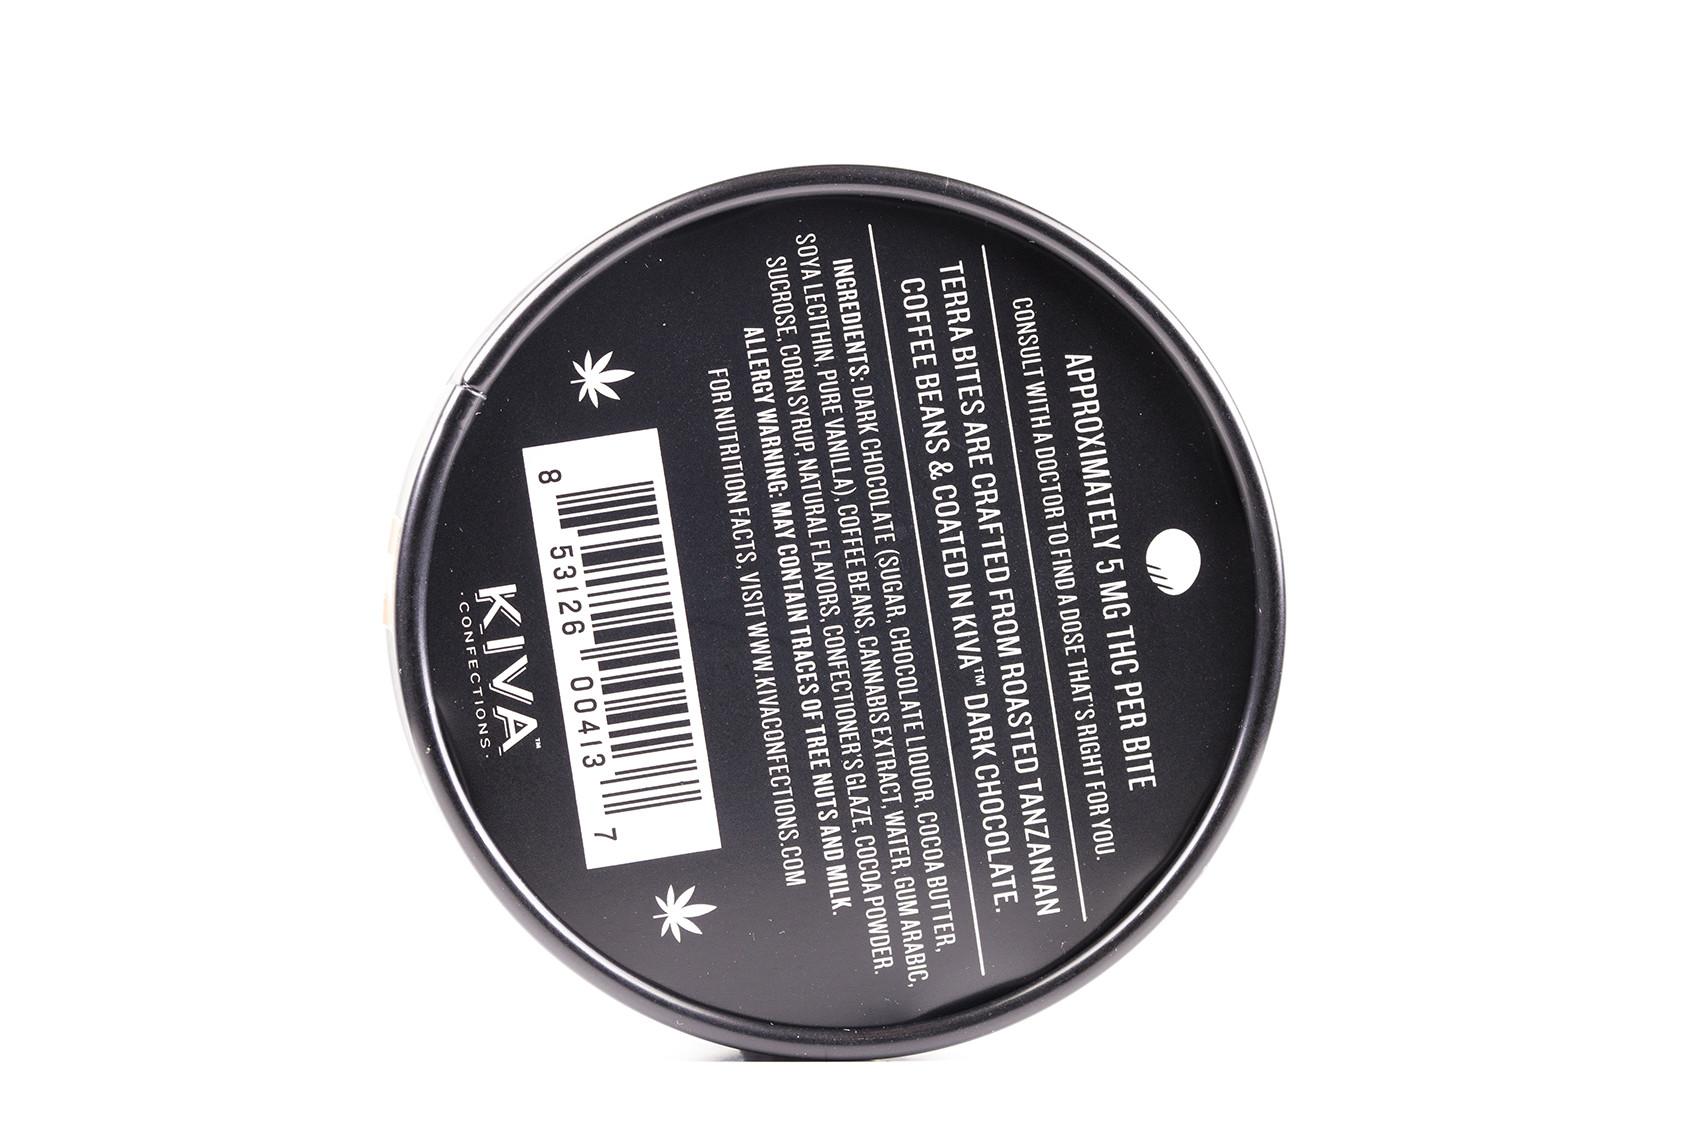 Kiva Espresso Terra Bites